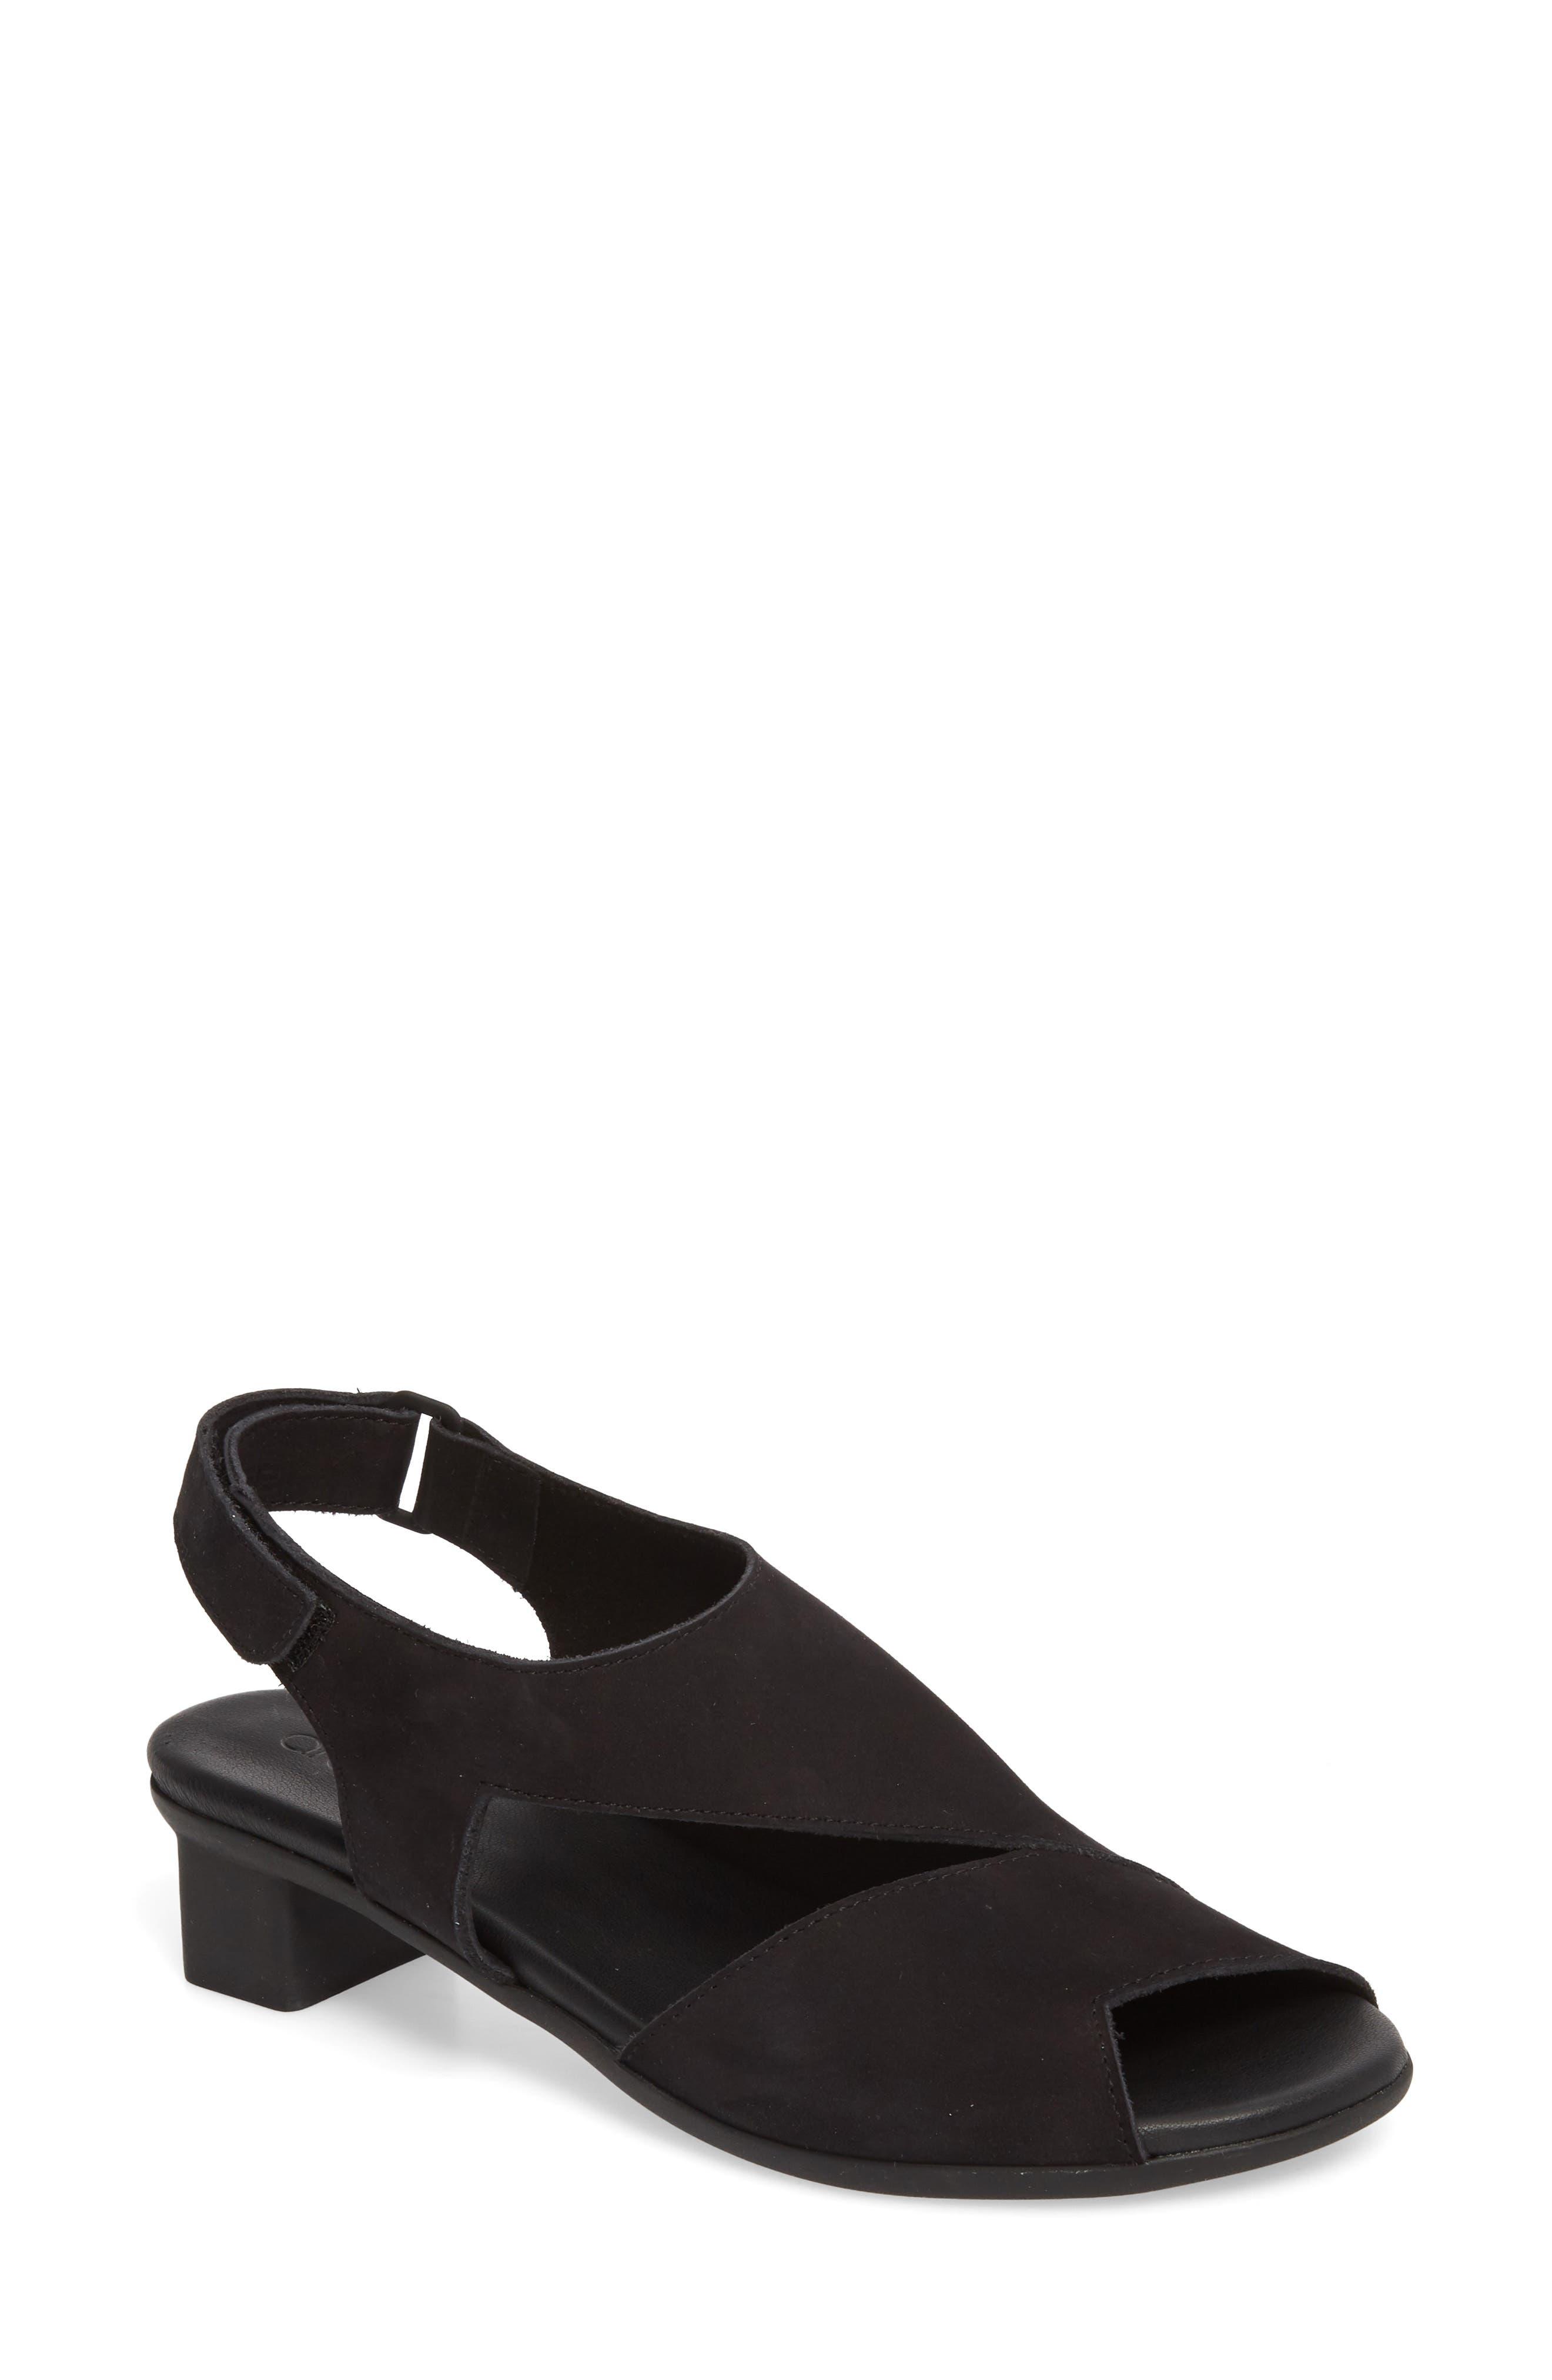 Obibbi Asymmetrical Slingback Sandal,                             Main thumbnail 1, color,                             NOIR NUBUCK